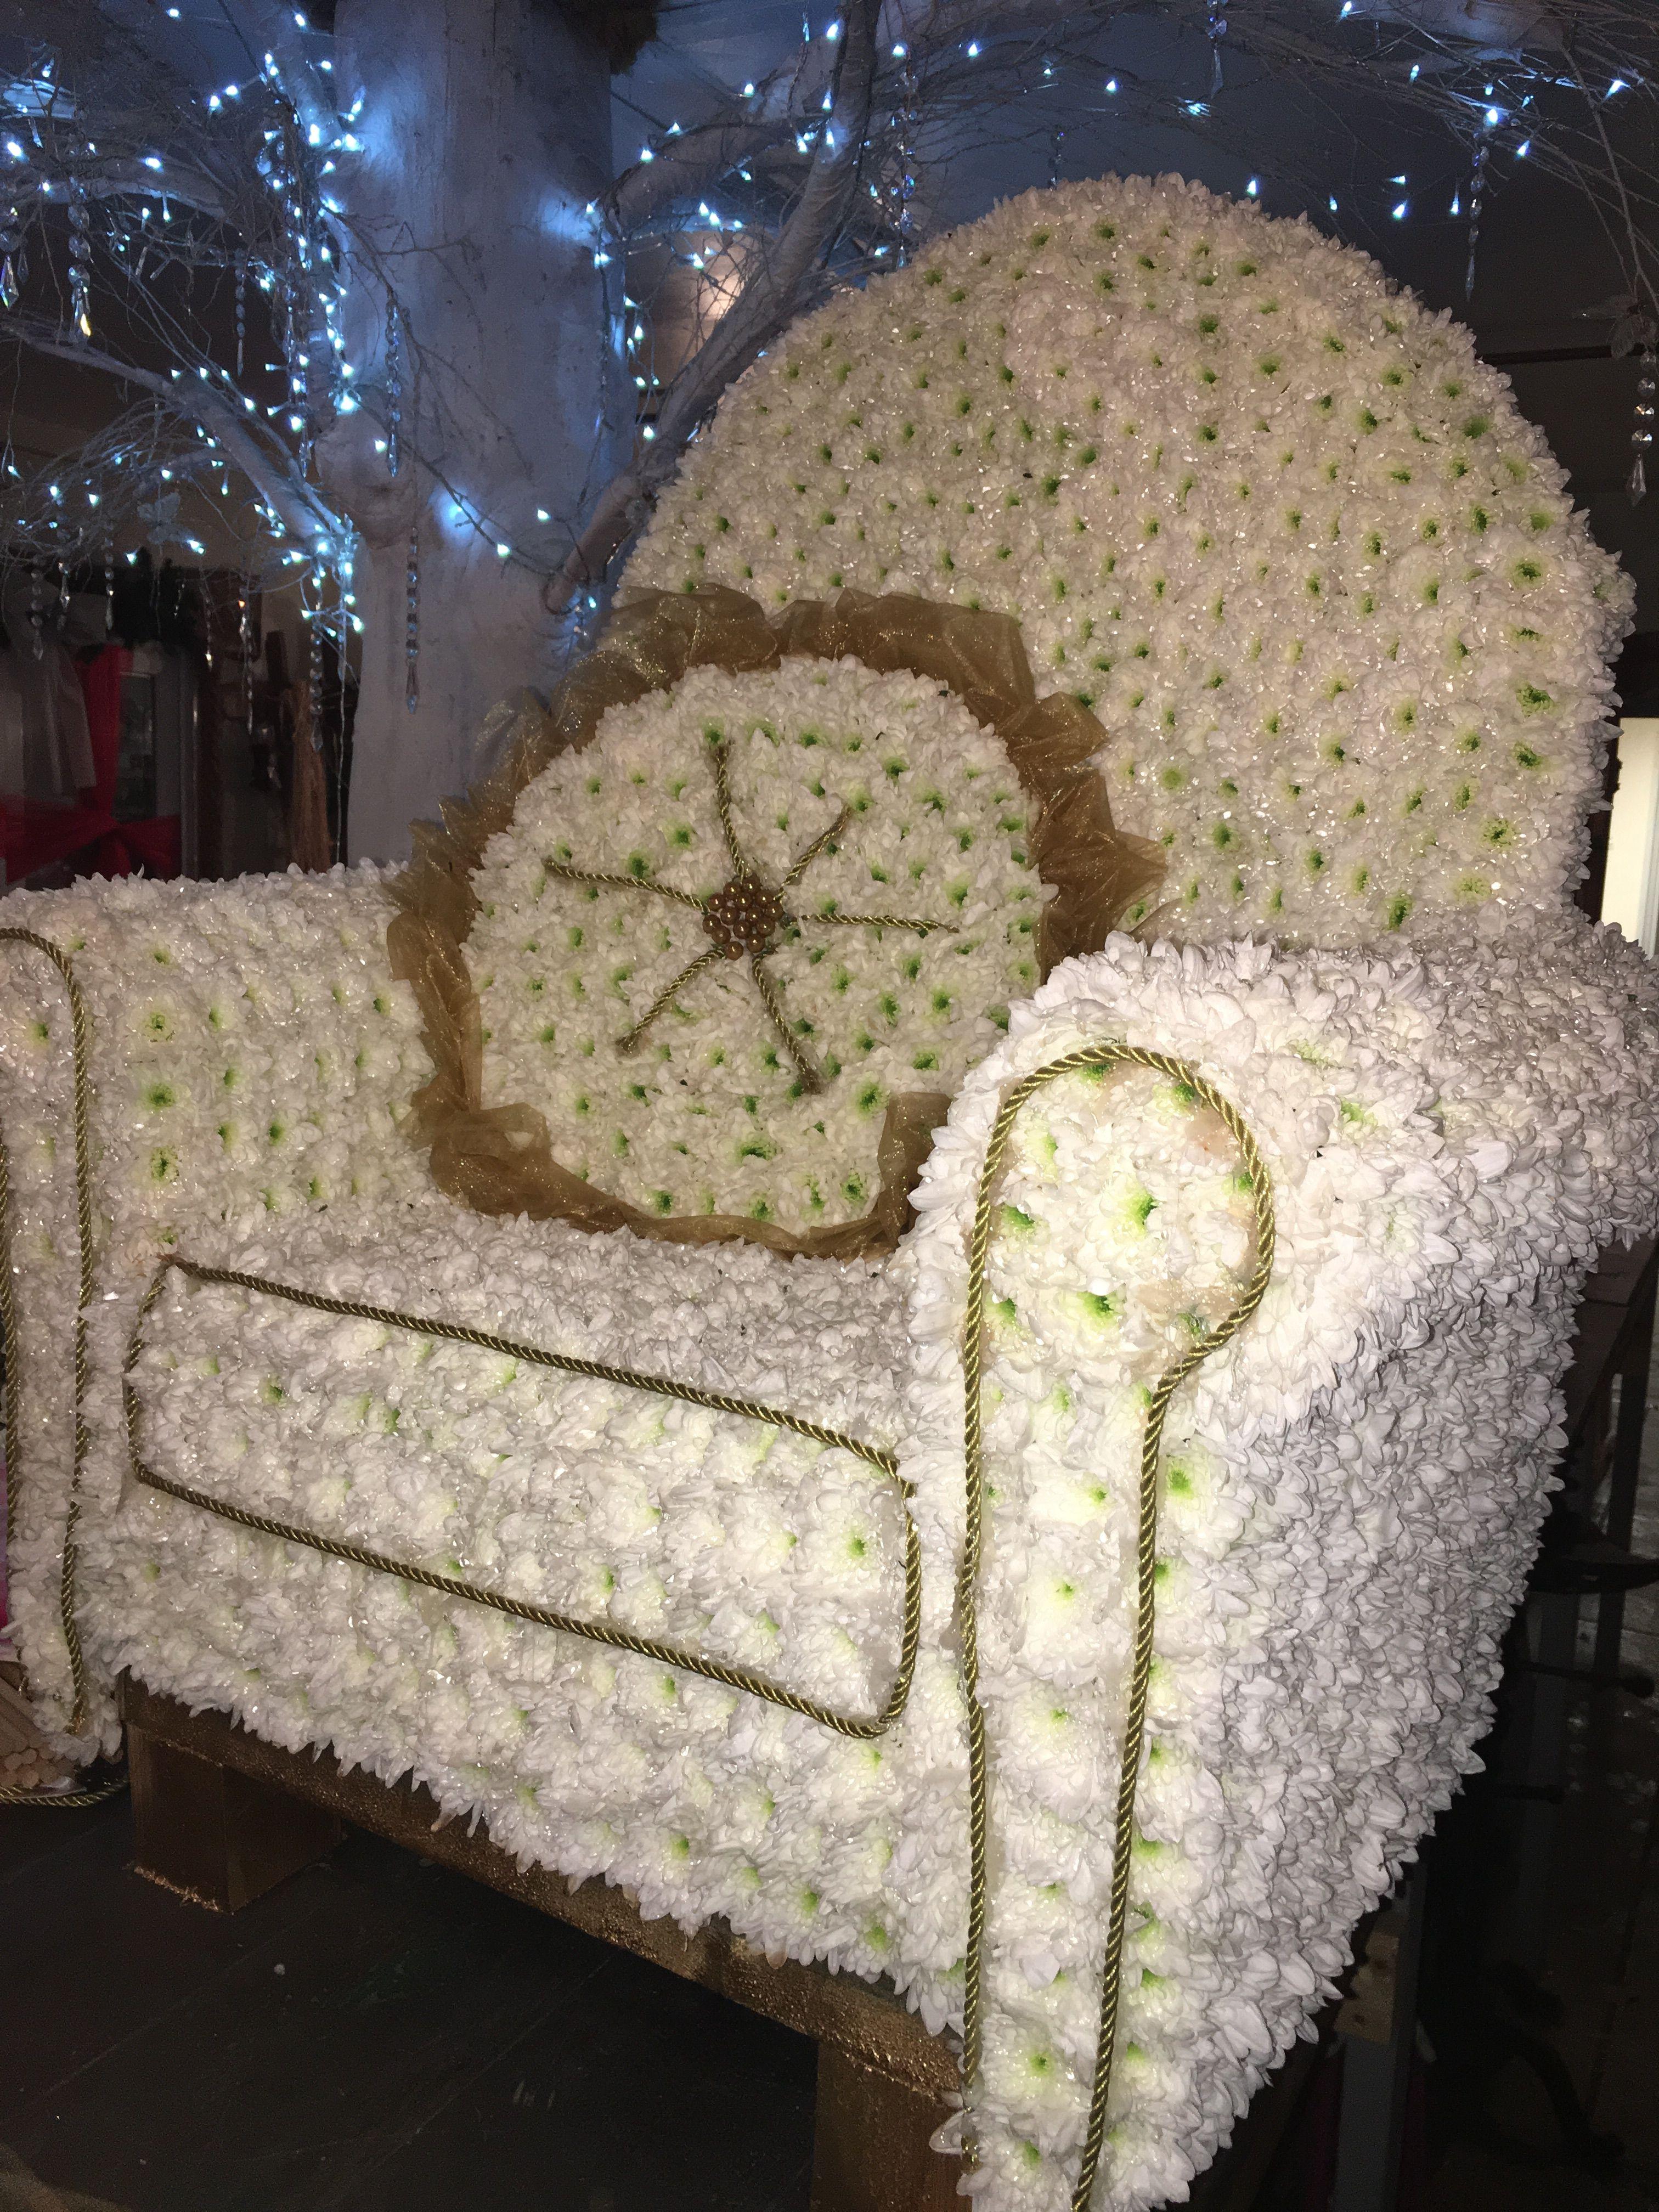 Vacant chair funeral flower tribute armchair funeral flower tribute vacant chair funeral flower tribute armchair funeral flower tribute bespoke funeral flowers thefloralartstudio izmirmasajfo